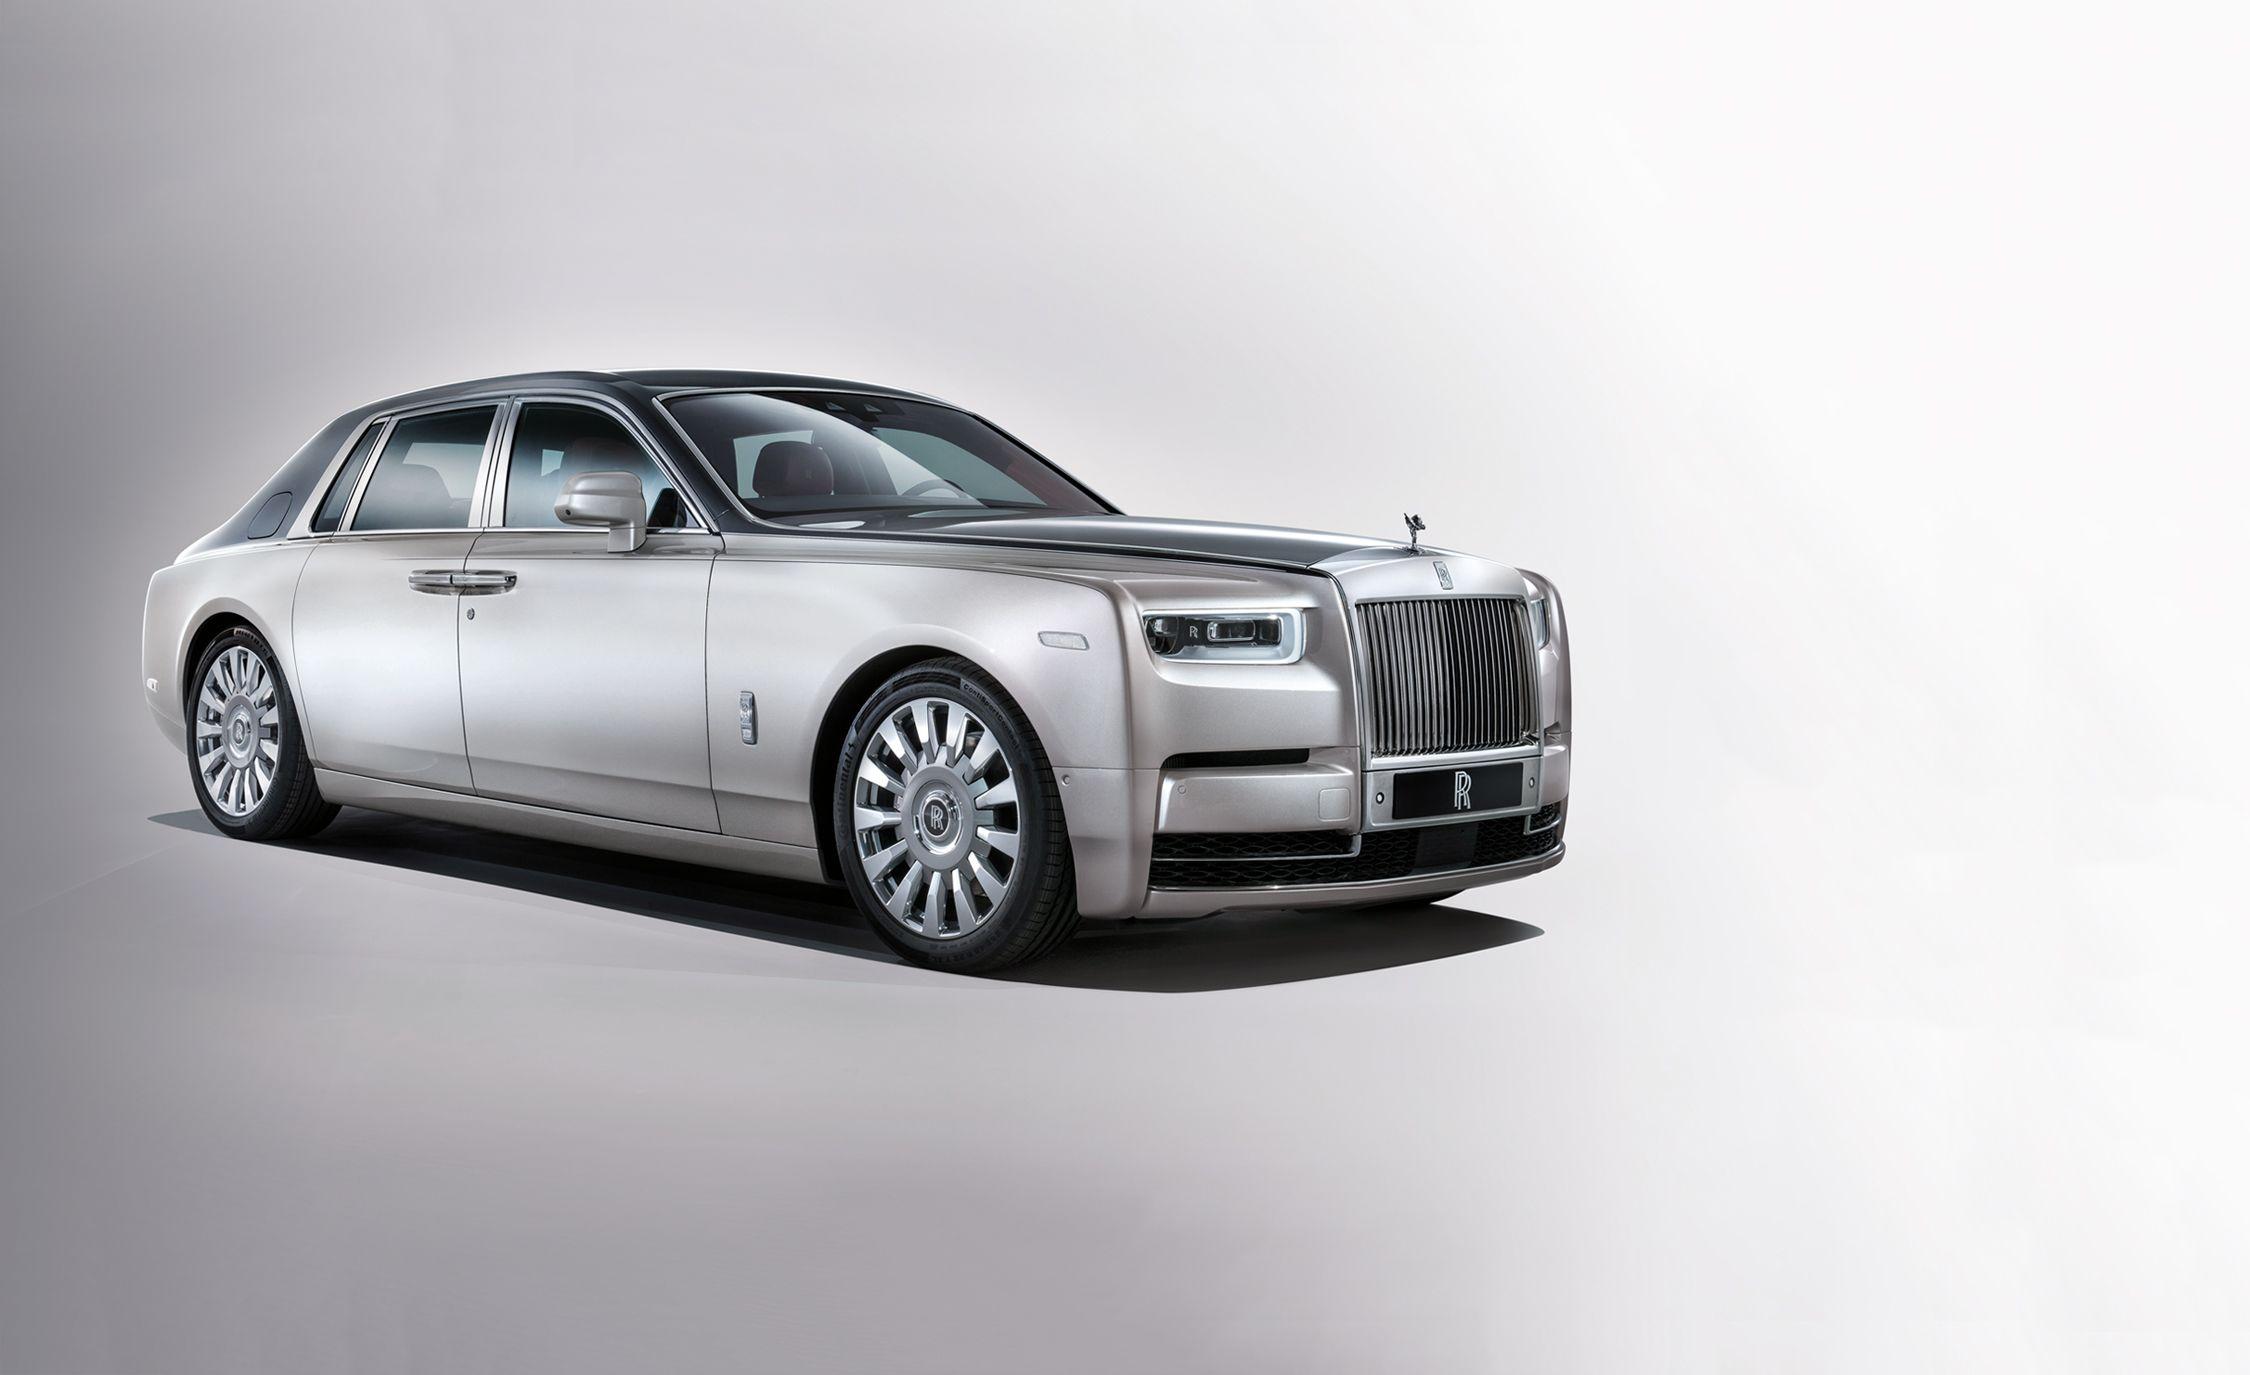 2018 Rolls-Royce Phantom: The Eighth Generation of Ultimate Luxury